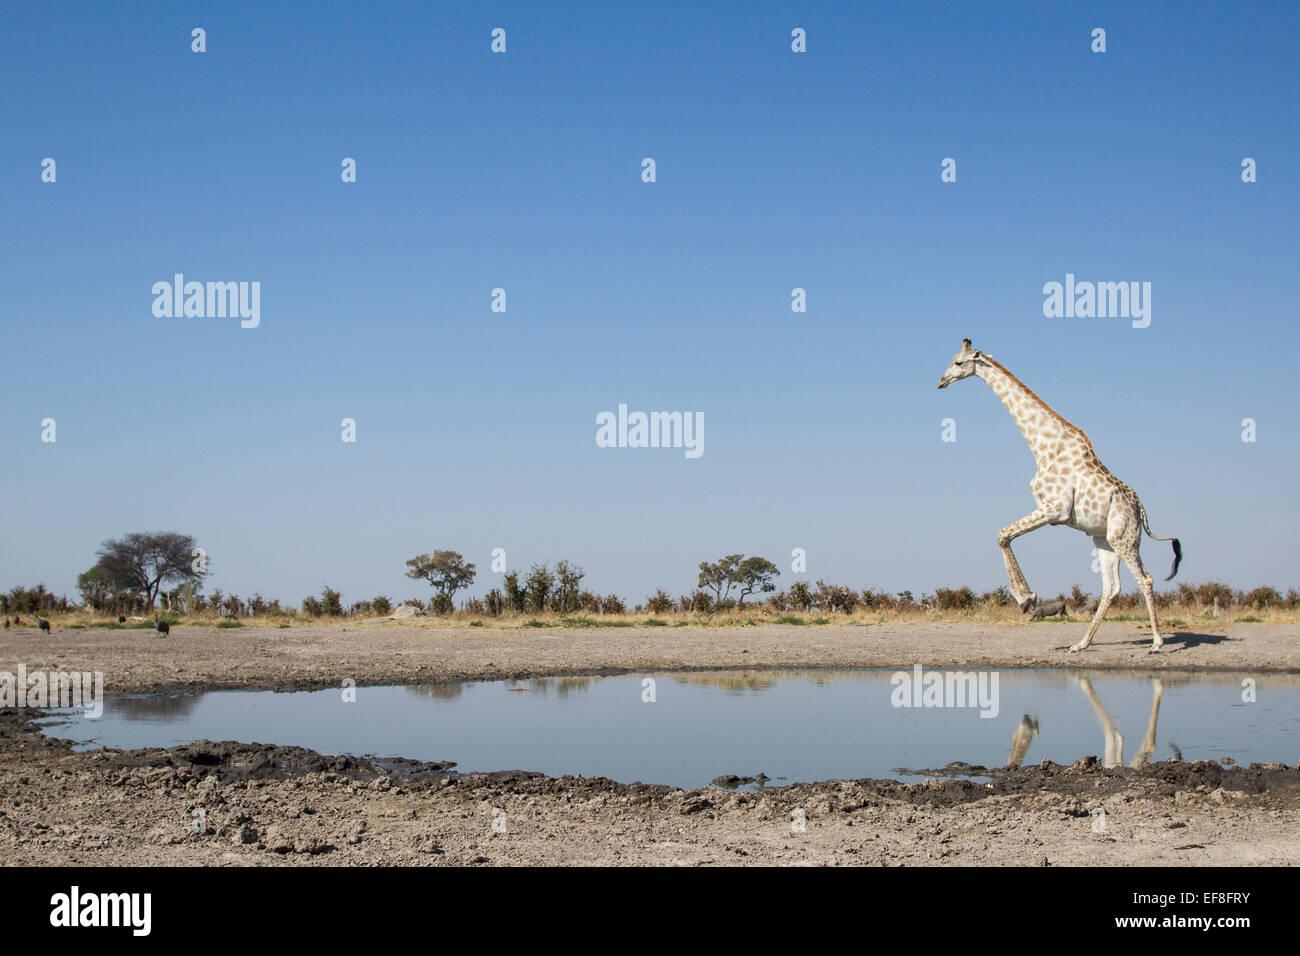 Africa, Botswana Chobe National Park, la giraffa (Giraffa camelopardalis) salta lontano dal bordo di Marabou Pan Immagini Stock